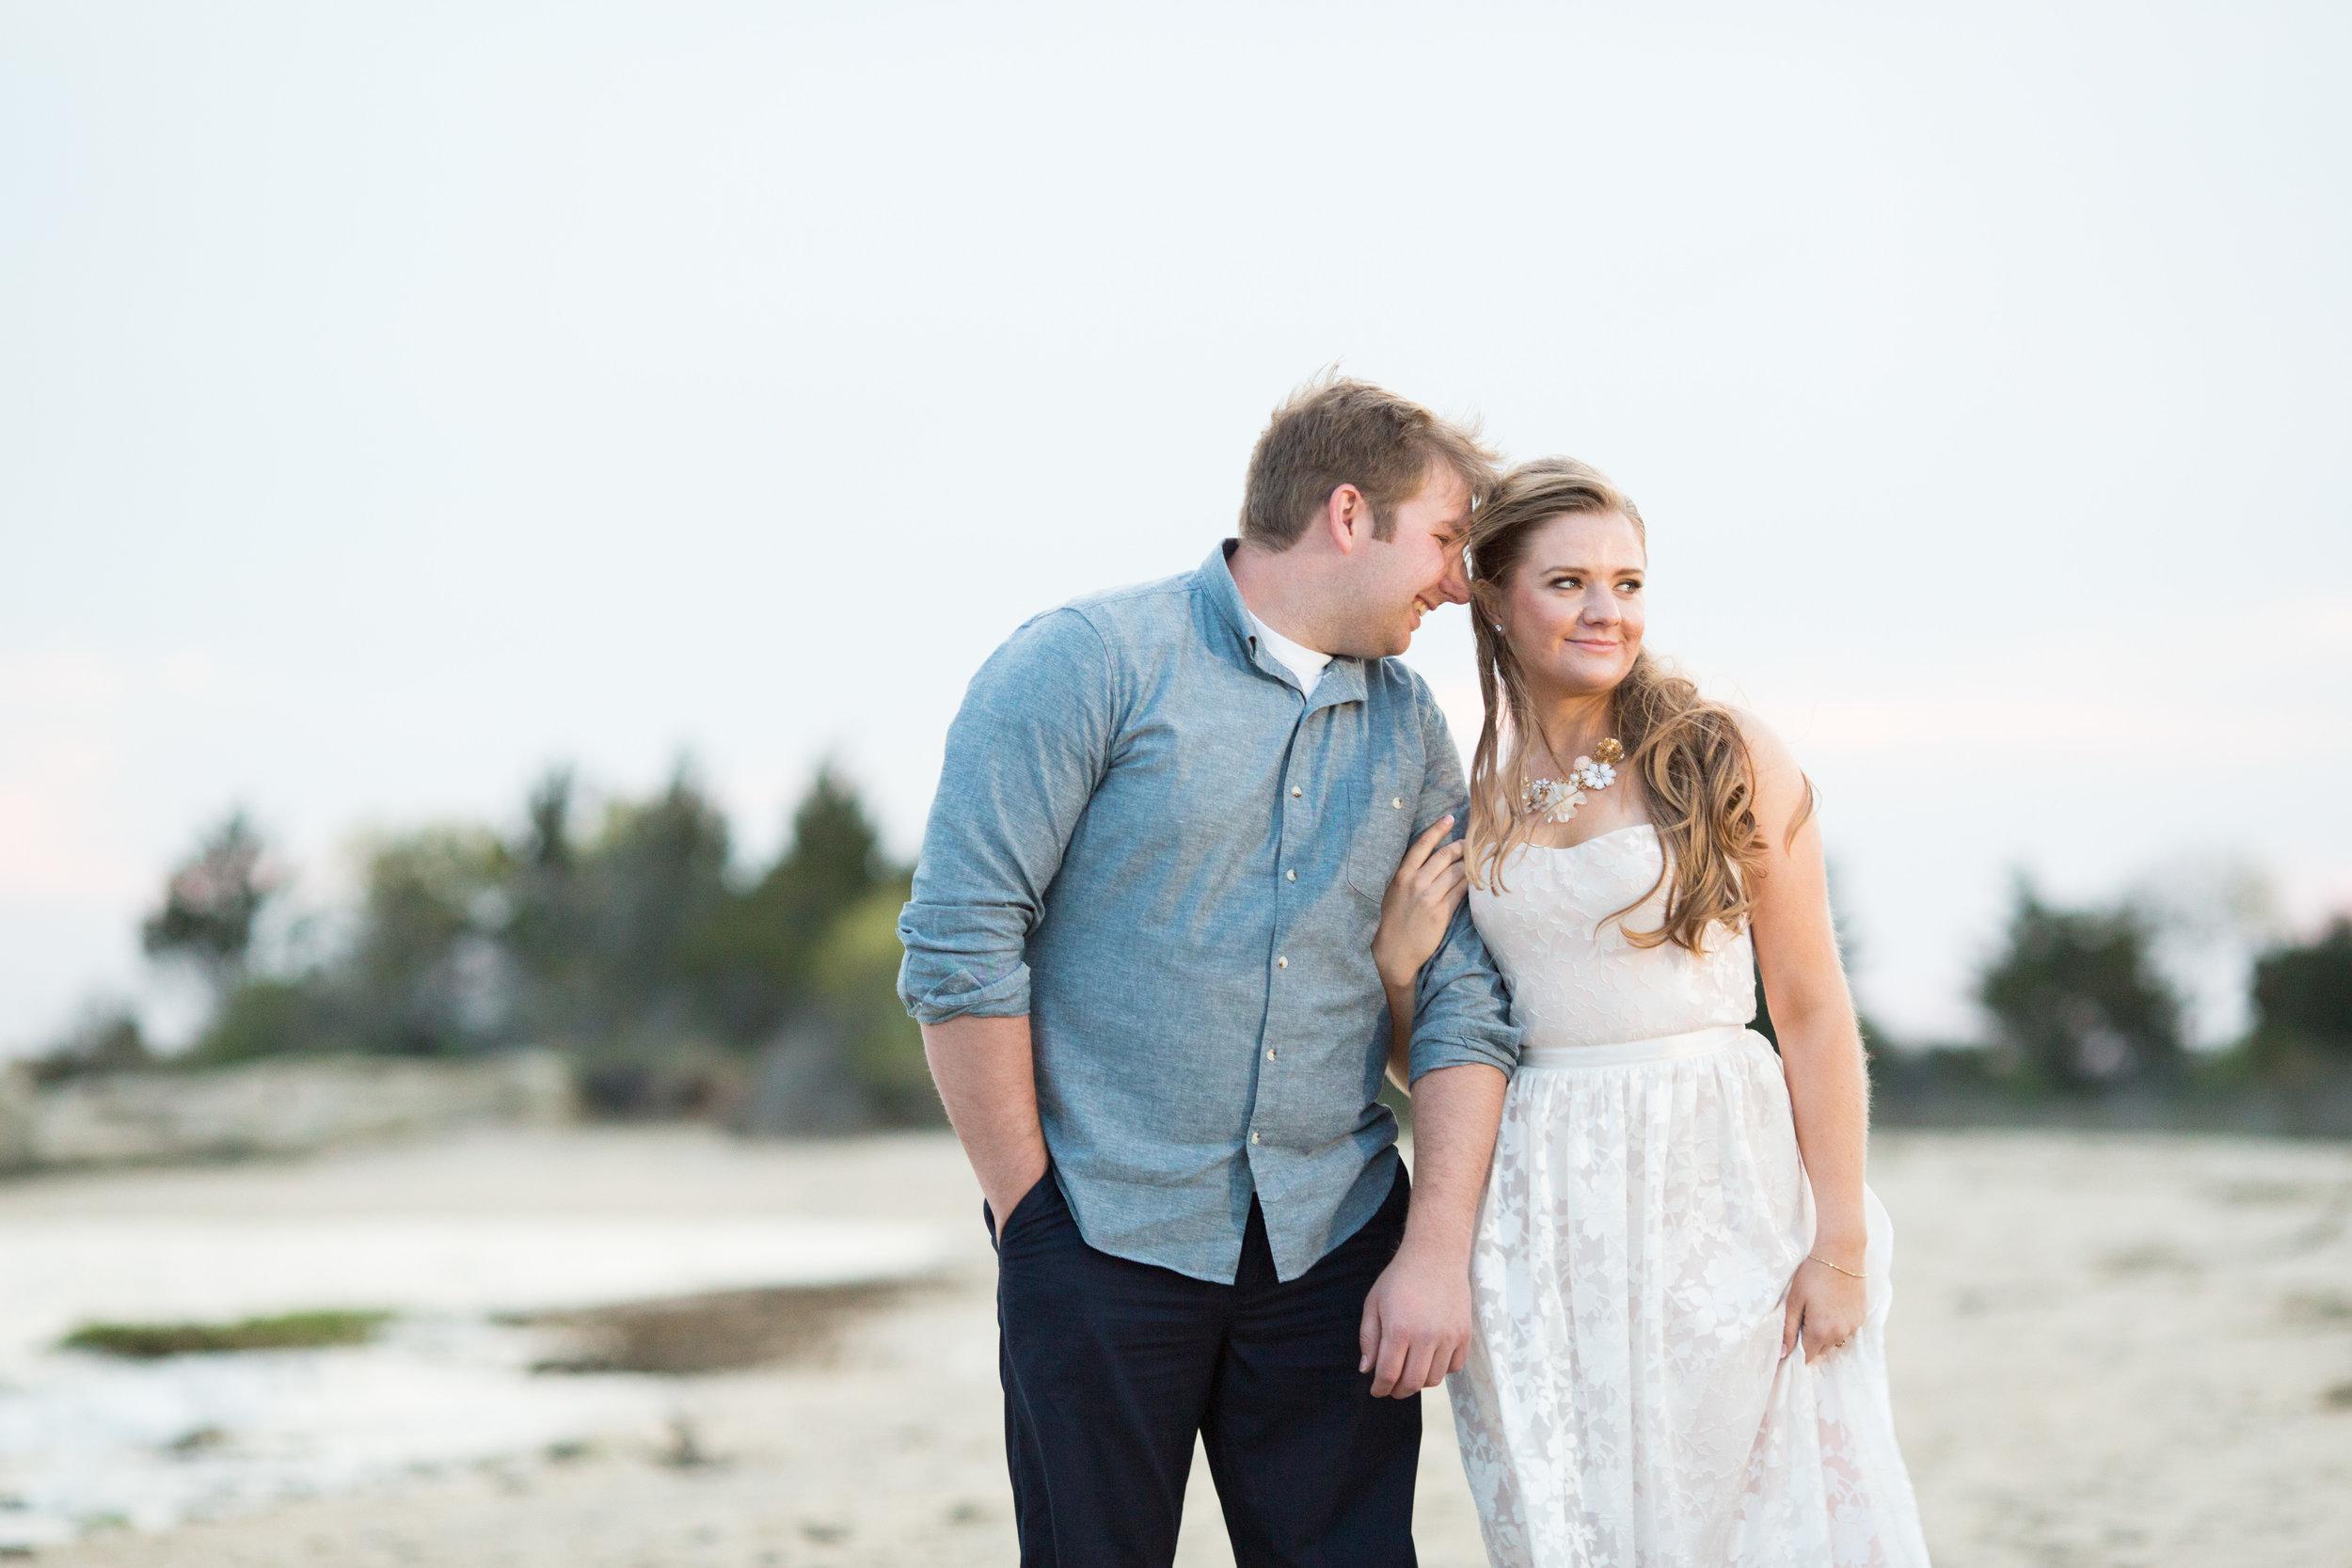 beach engagement photo shoot with jaye kogut photography at sandy hook